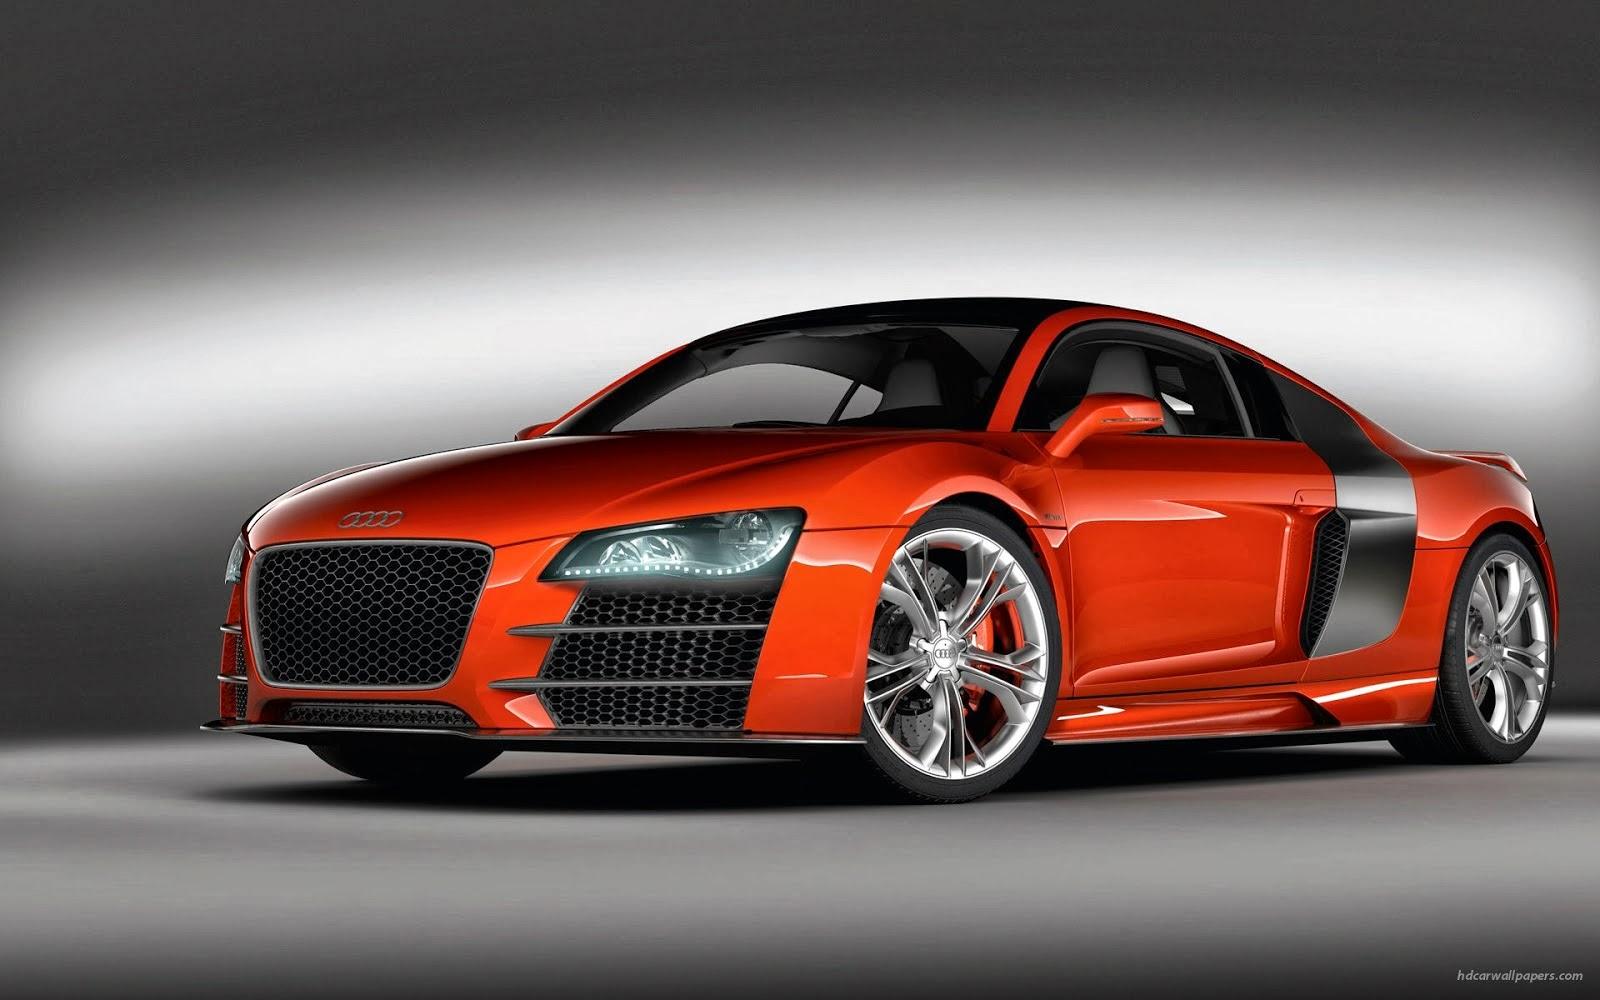 Bugatti Veyron Hd Wallpapers 2013 Audi R8 Hd Wallpaper Free Hd Wallpapers